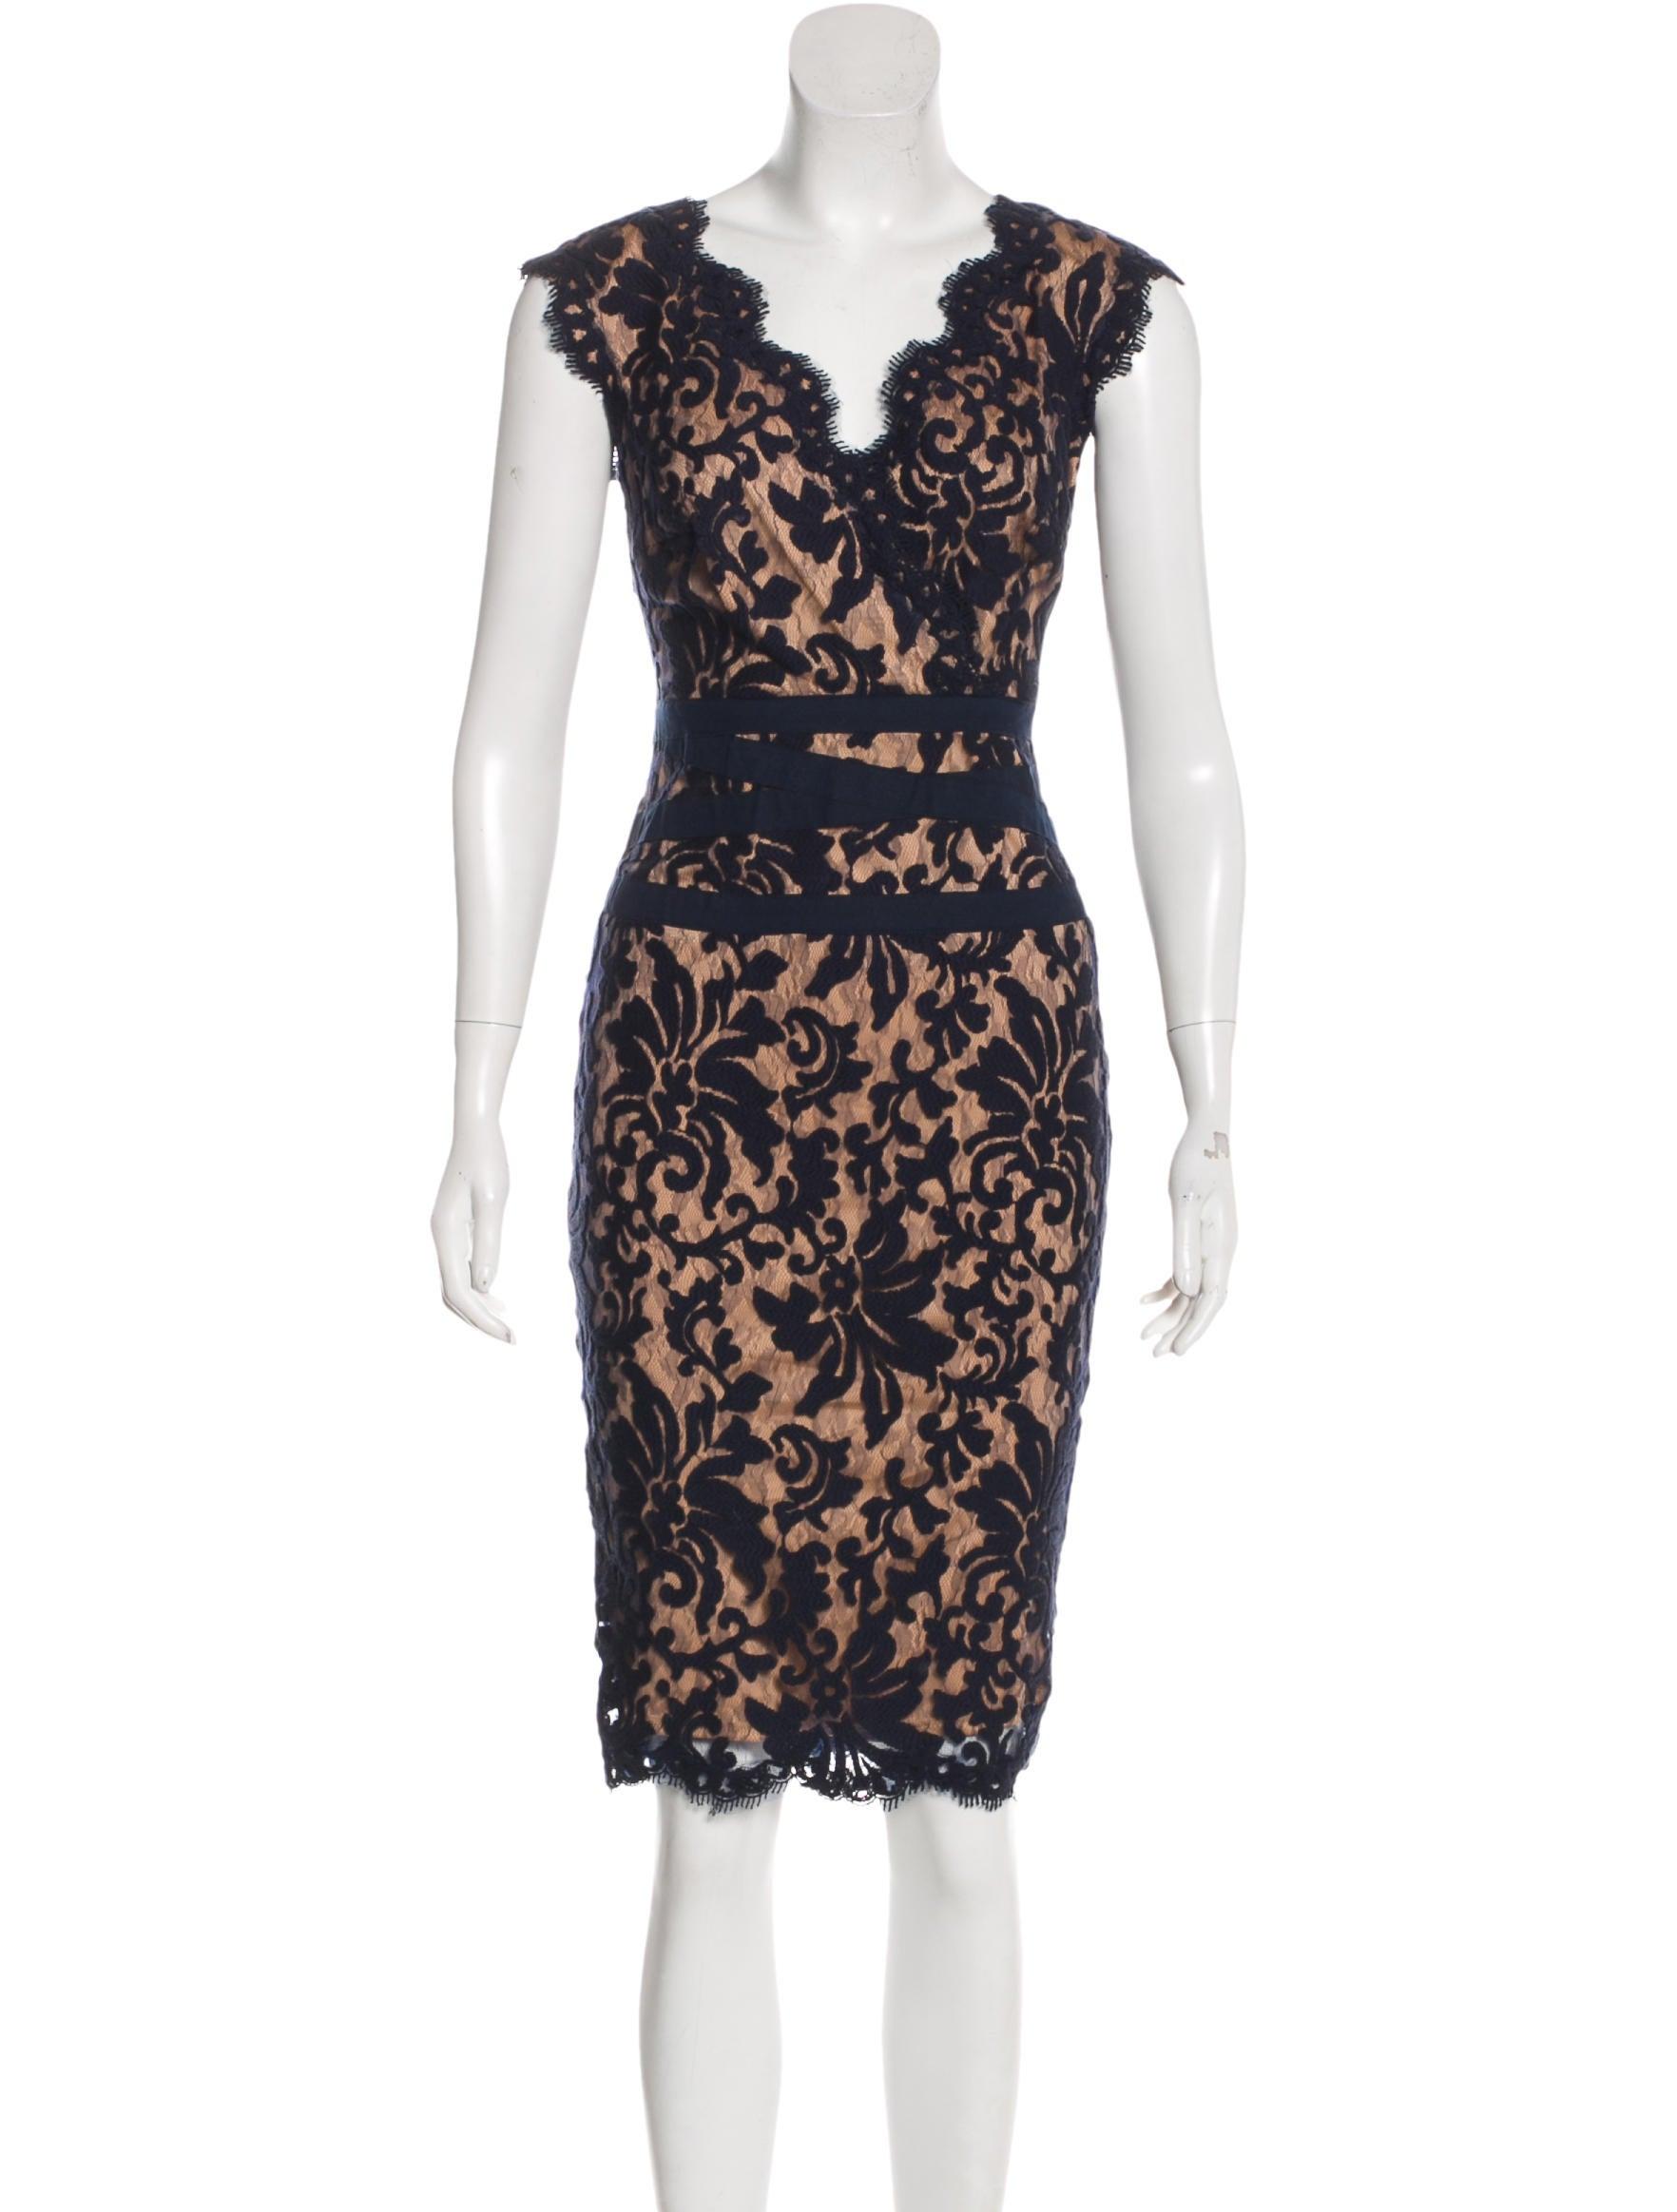 Tadashi Shoji Embroidered Lace Dress - Clothing - WTASH20373 | The ...